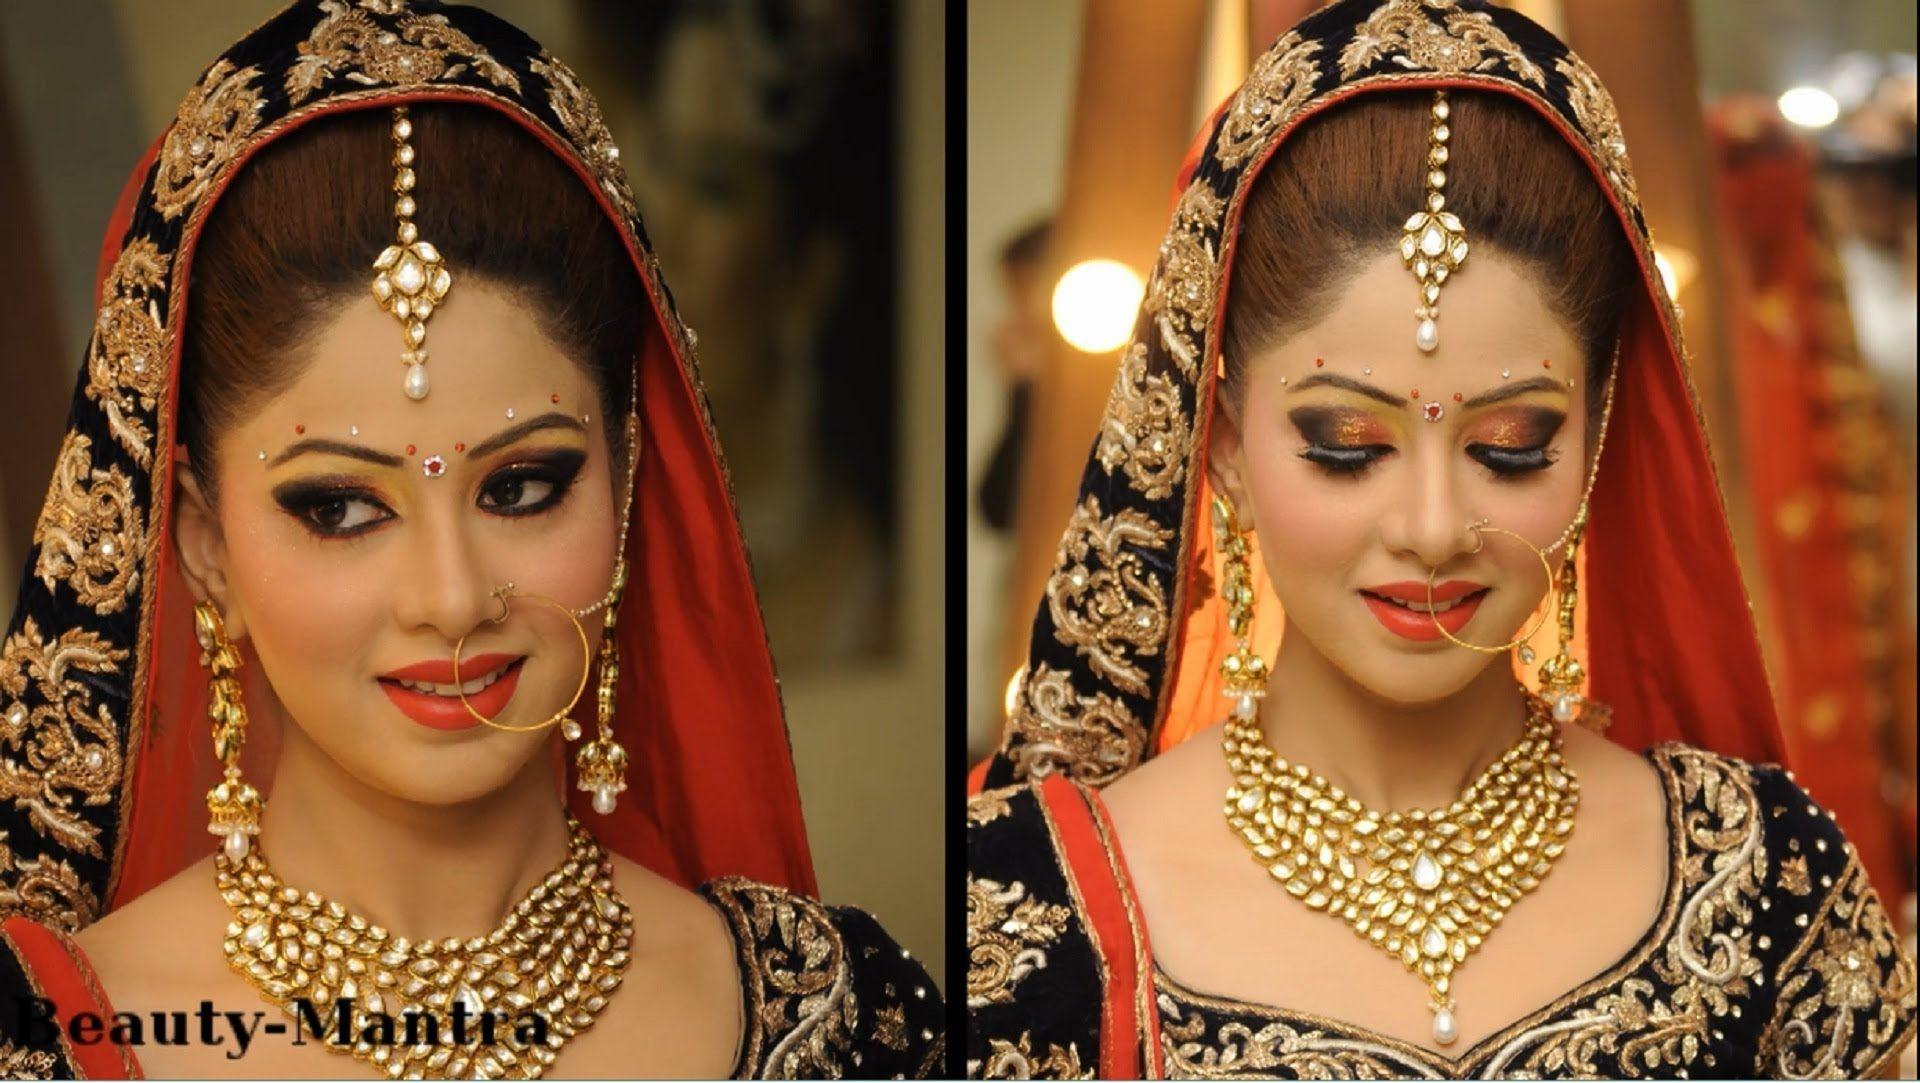 Worst makeup mistakes on your wedding indian bridal diaries - A2817d668de1dd6c9364998ef83051c3 Jpg